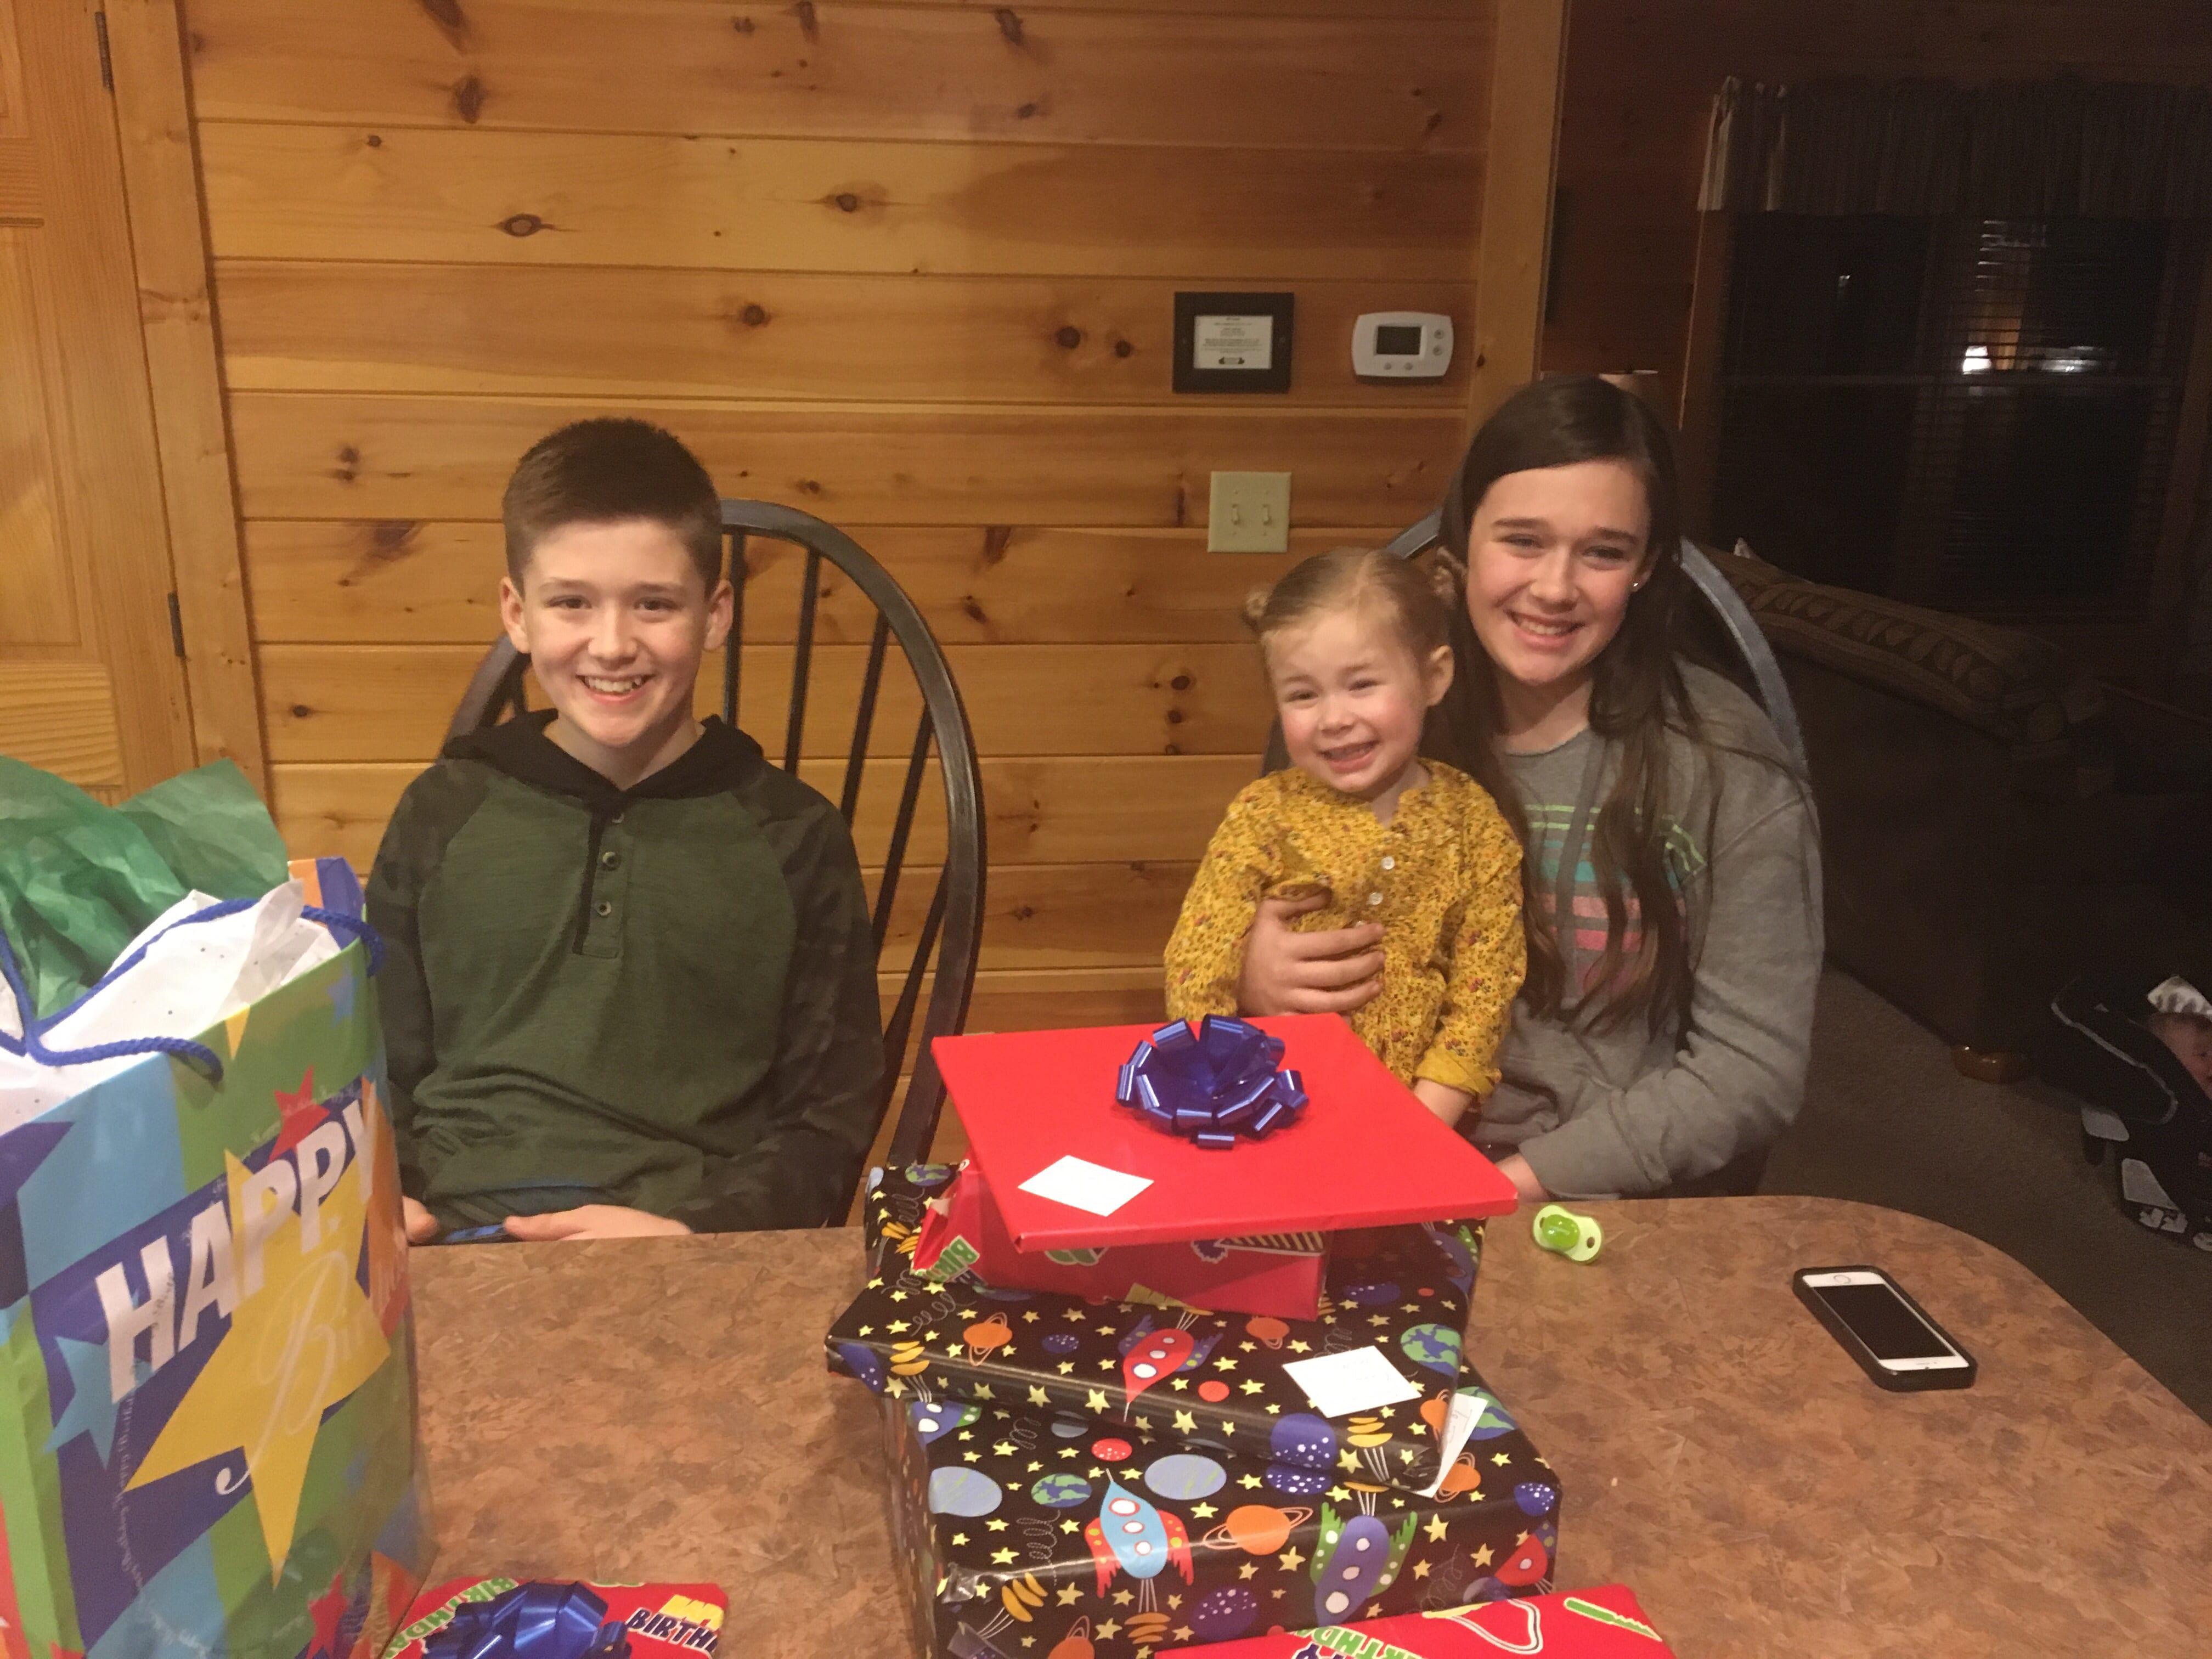 birthday celebration for 3 kids in a cabin